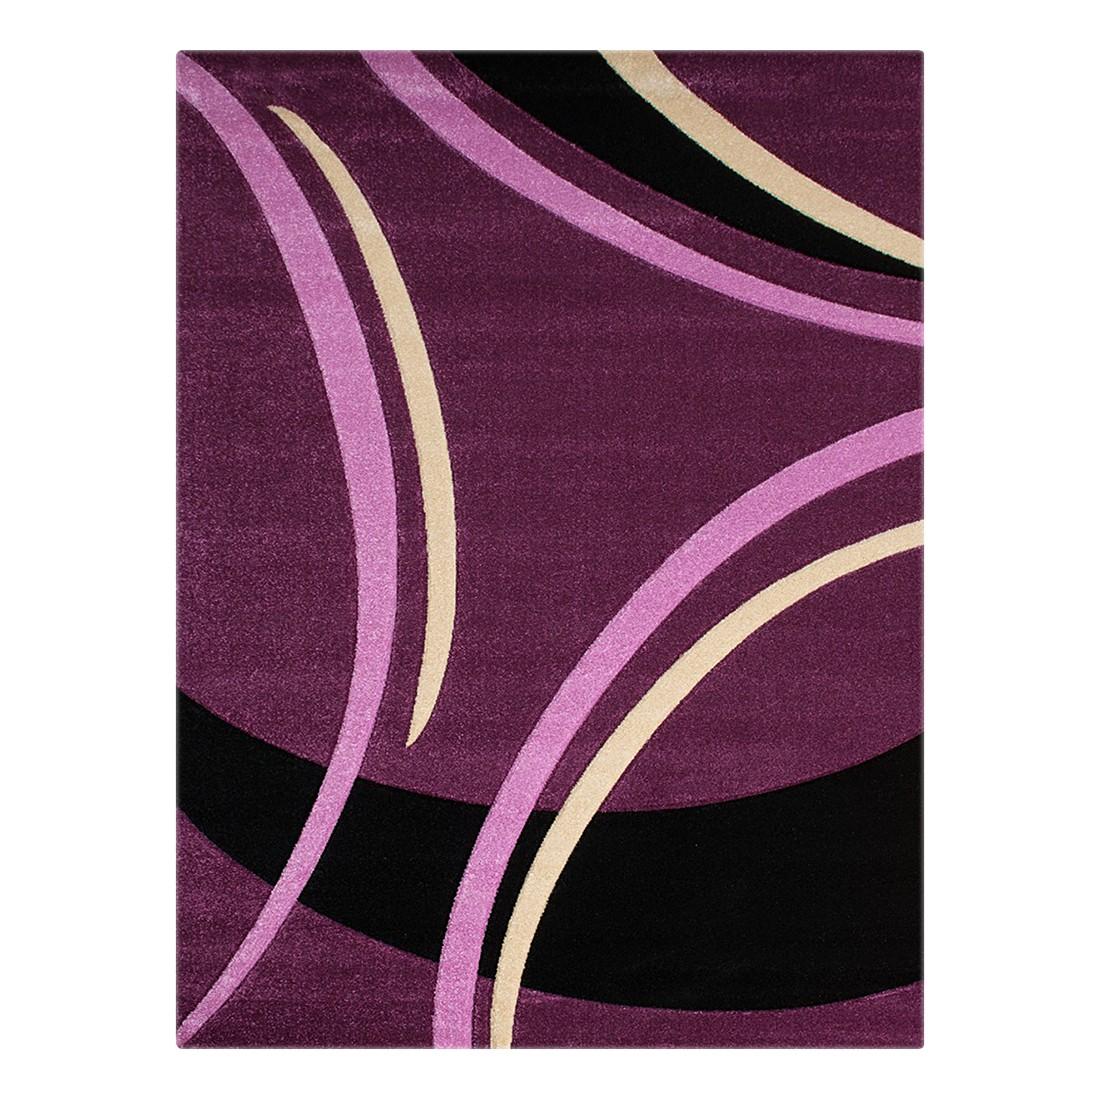 Teppich Nea Linien I – Lila – 120 x 170 cm, Testil kaufen